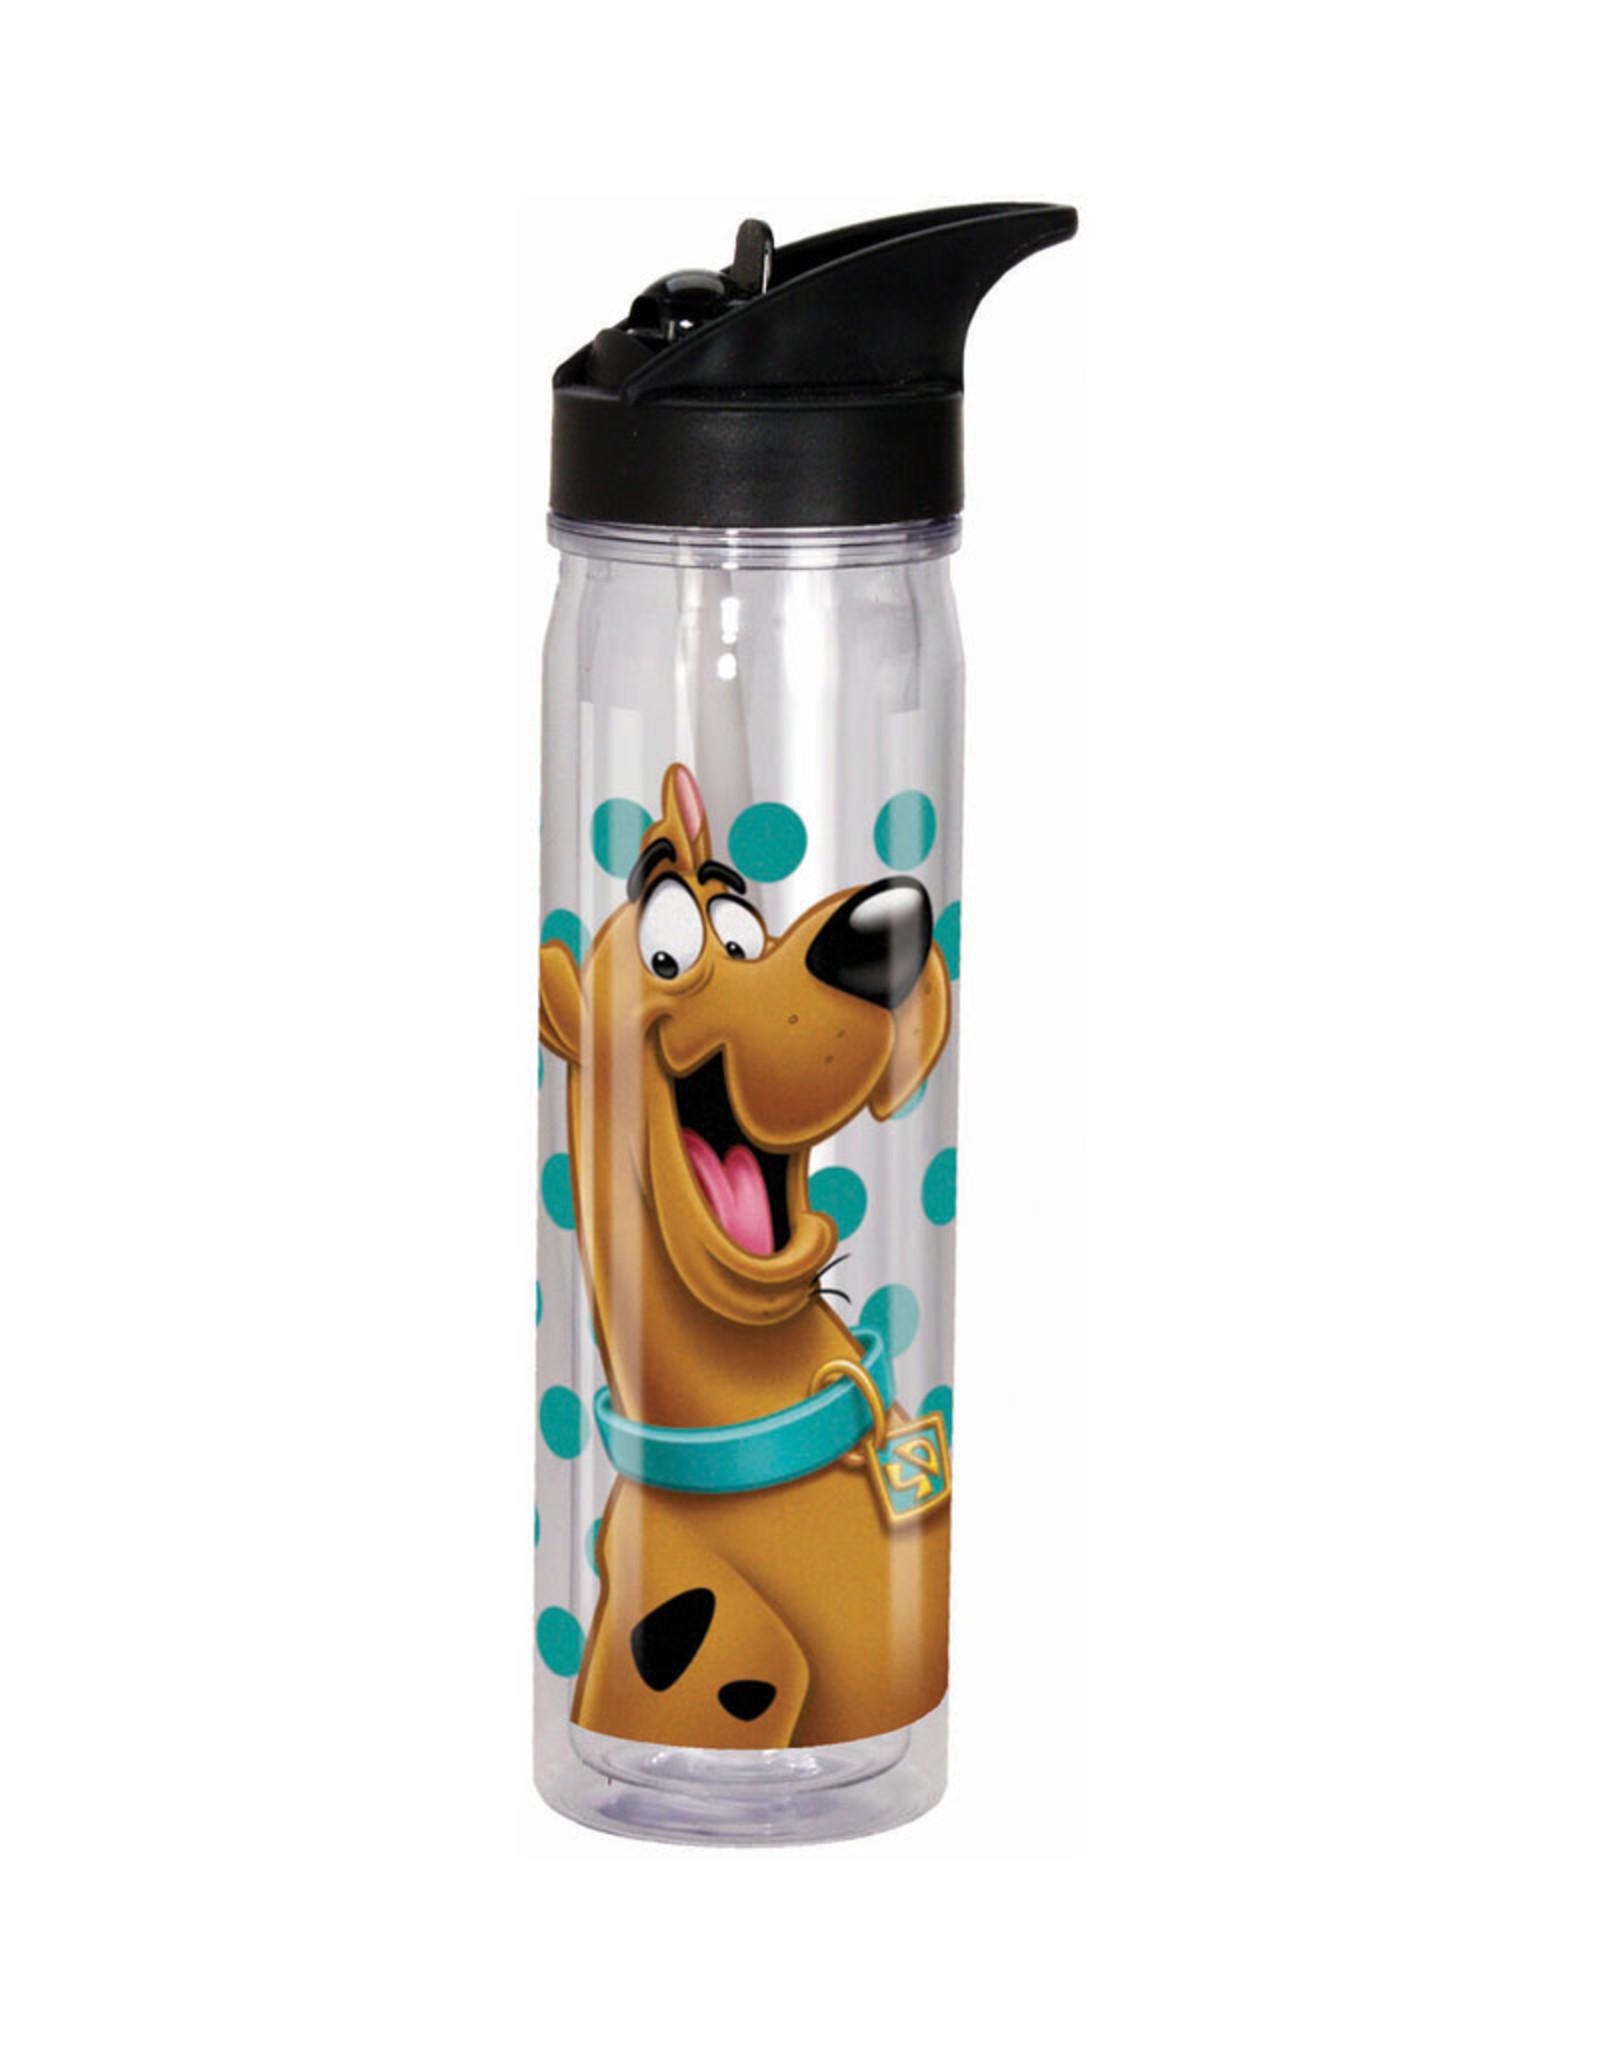 Scooby-Doo ( Acrylic Bottle ) Dots